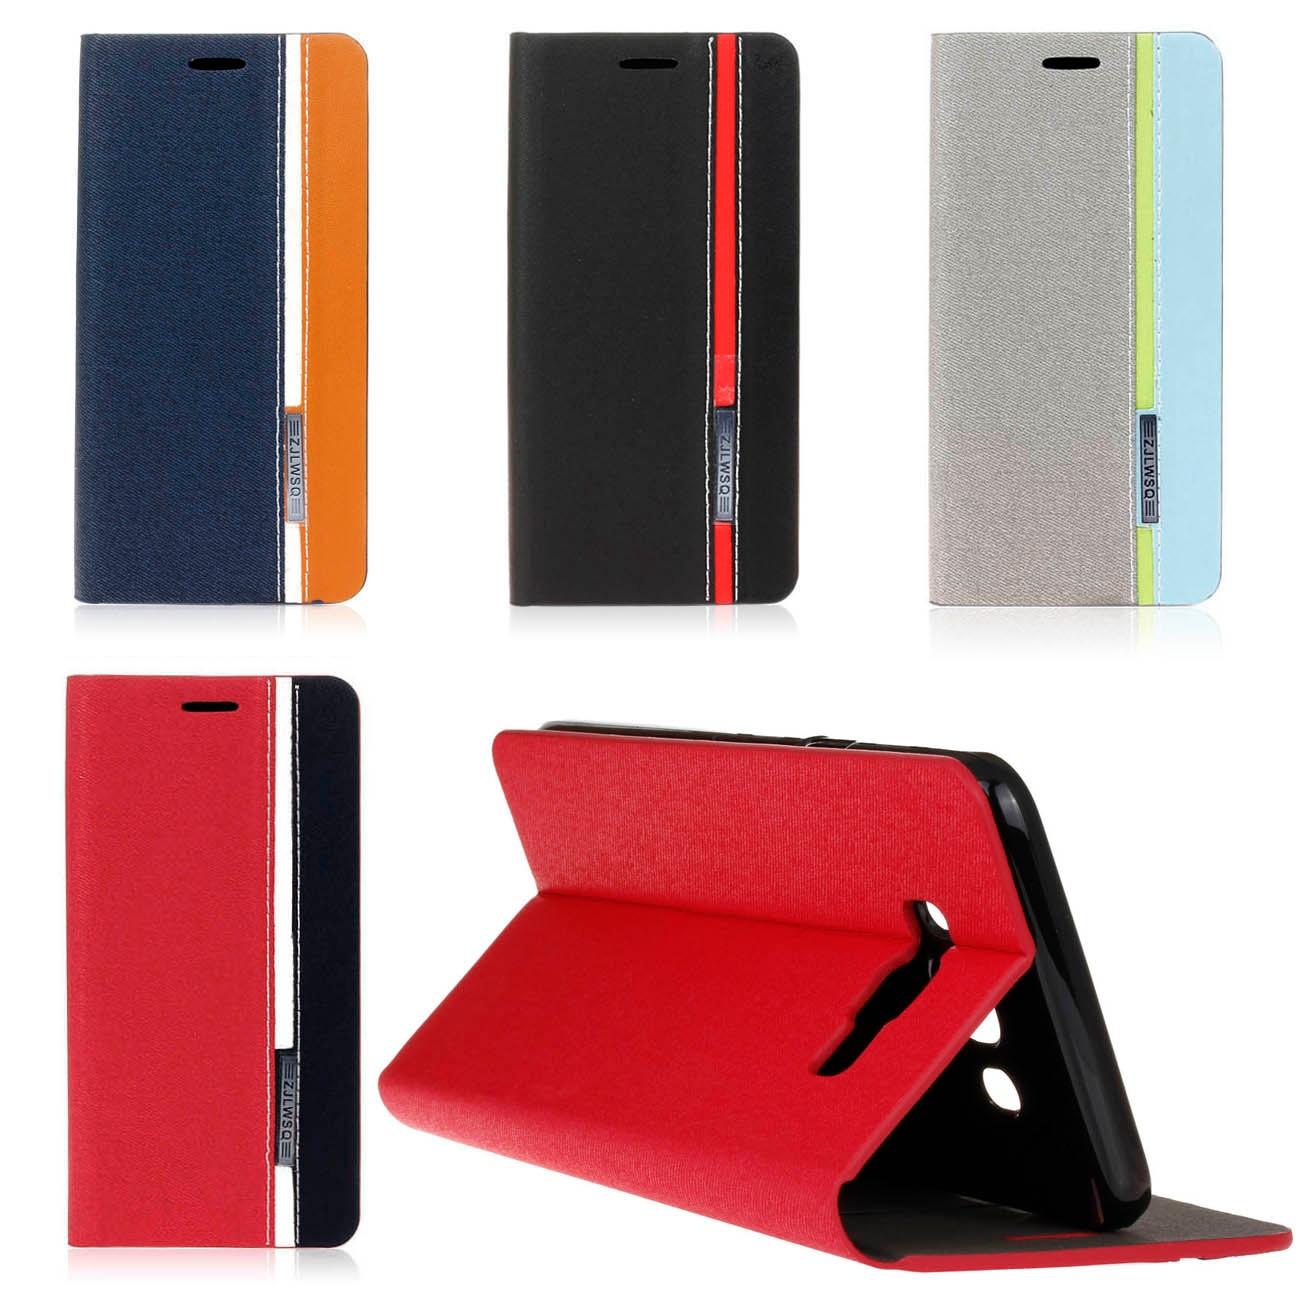 De calidad superior 3 colores case para asus zenfone go zc451tg z00sd GOZ00SD ZC